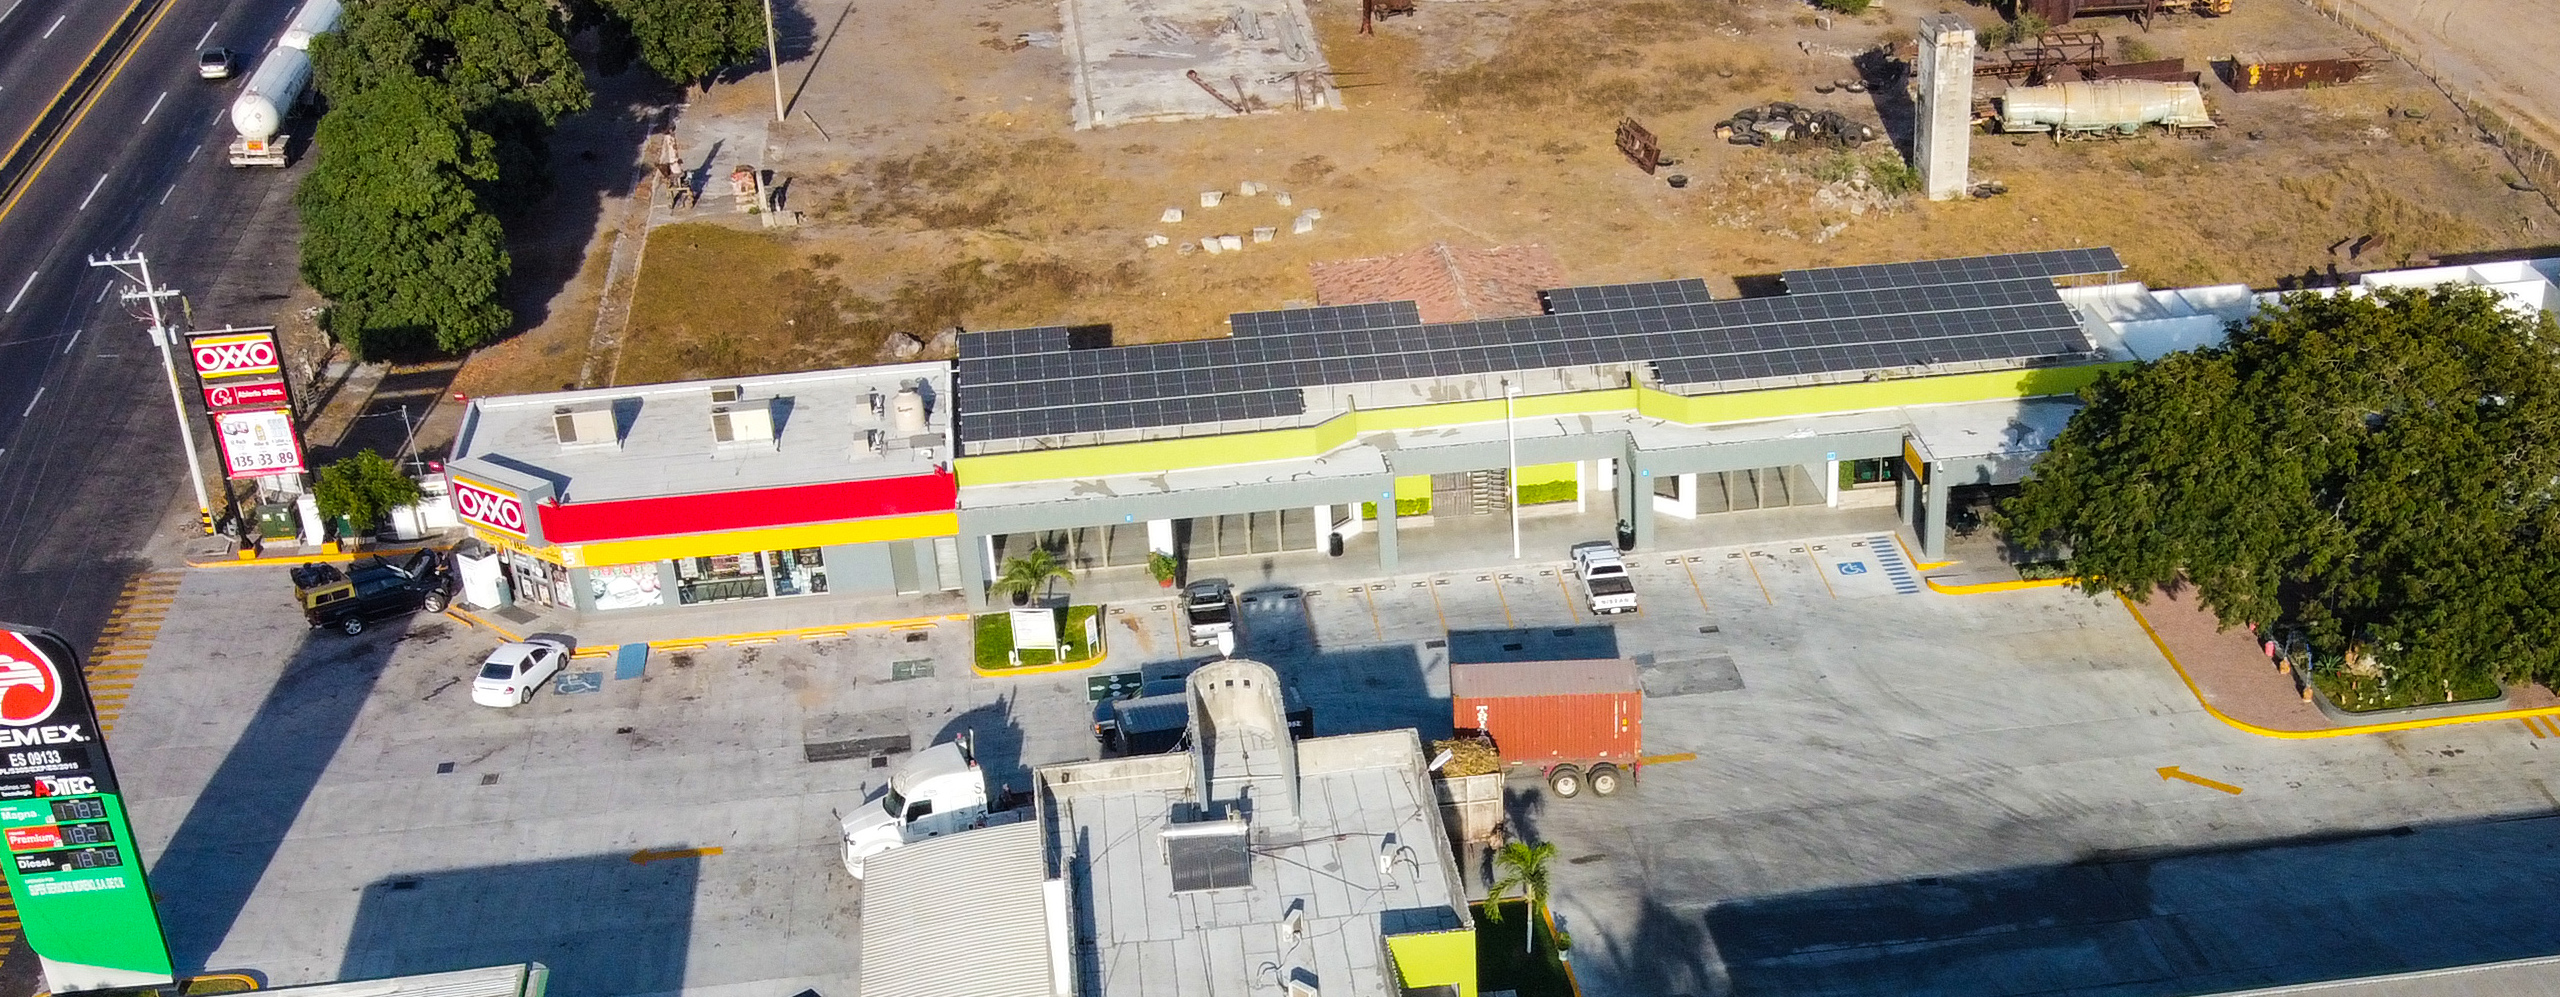 Gasolinera Súper Servicios Moreno Tecomán